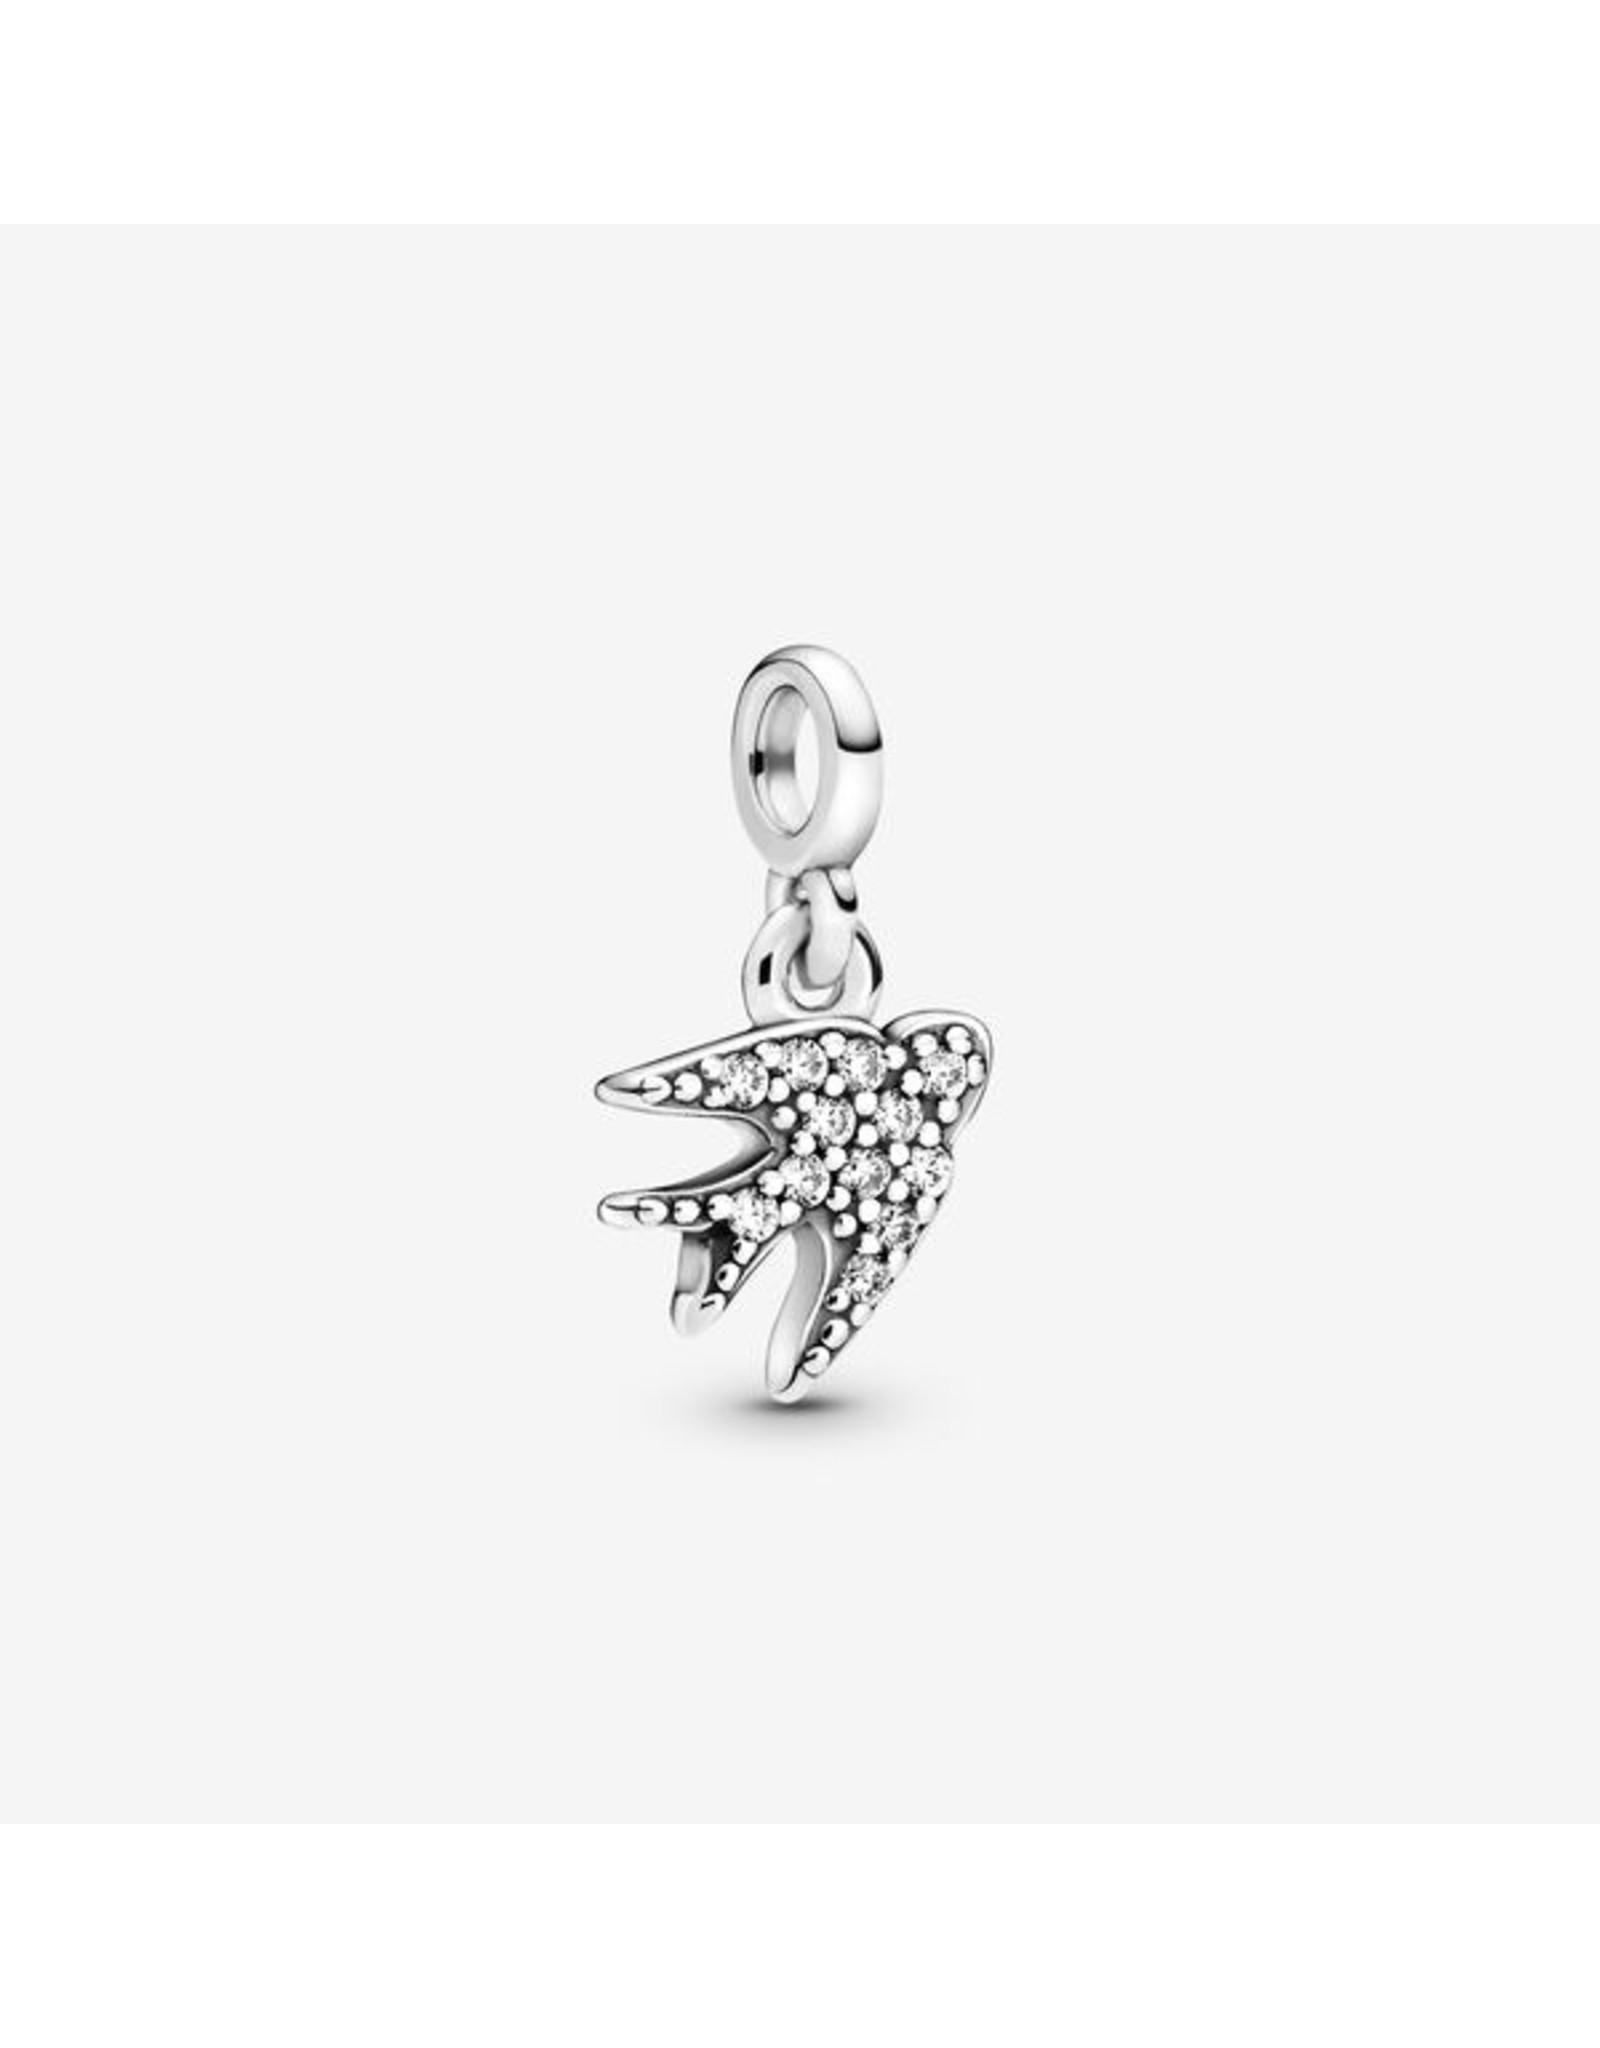 Pandora Pandora ME Charm,798984C01, My Swallow Dangle, Clear CZ